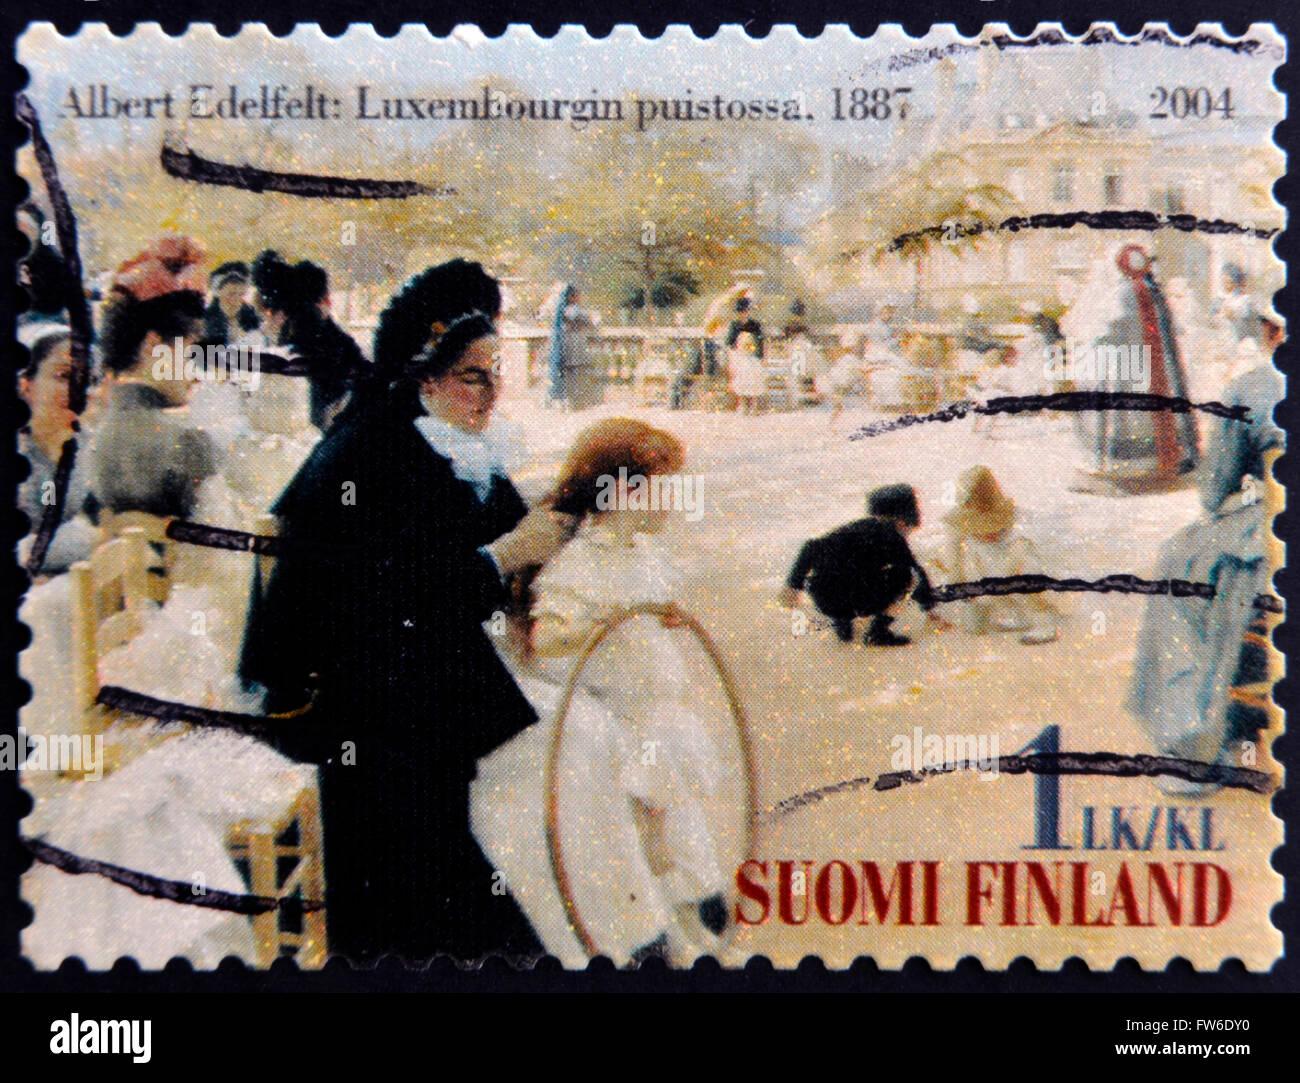 FINLAND - CIRCA 2004: stamp printed in Finland shows women in Luxembourg Garden, picture of Albert Edelfelt, circa 2004 Stock Photo